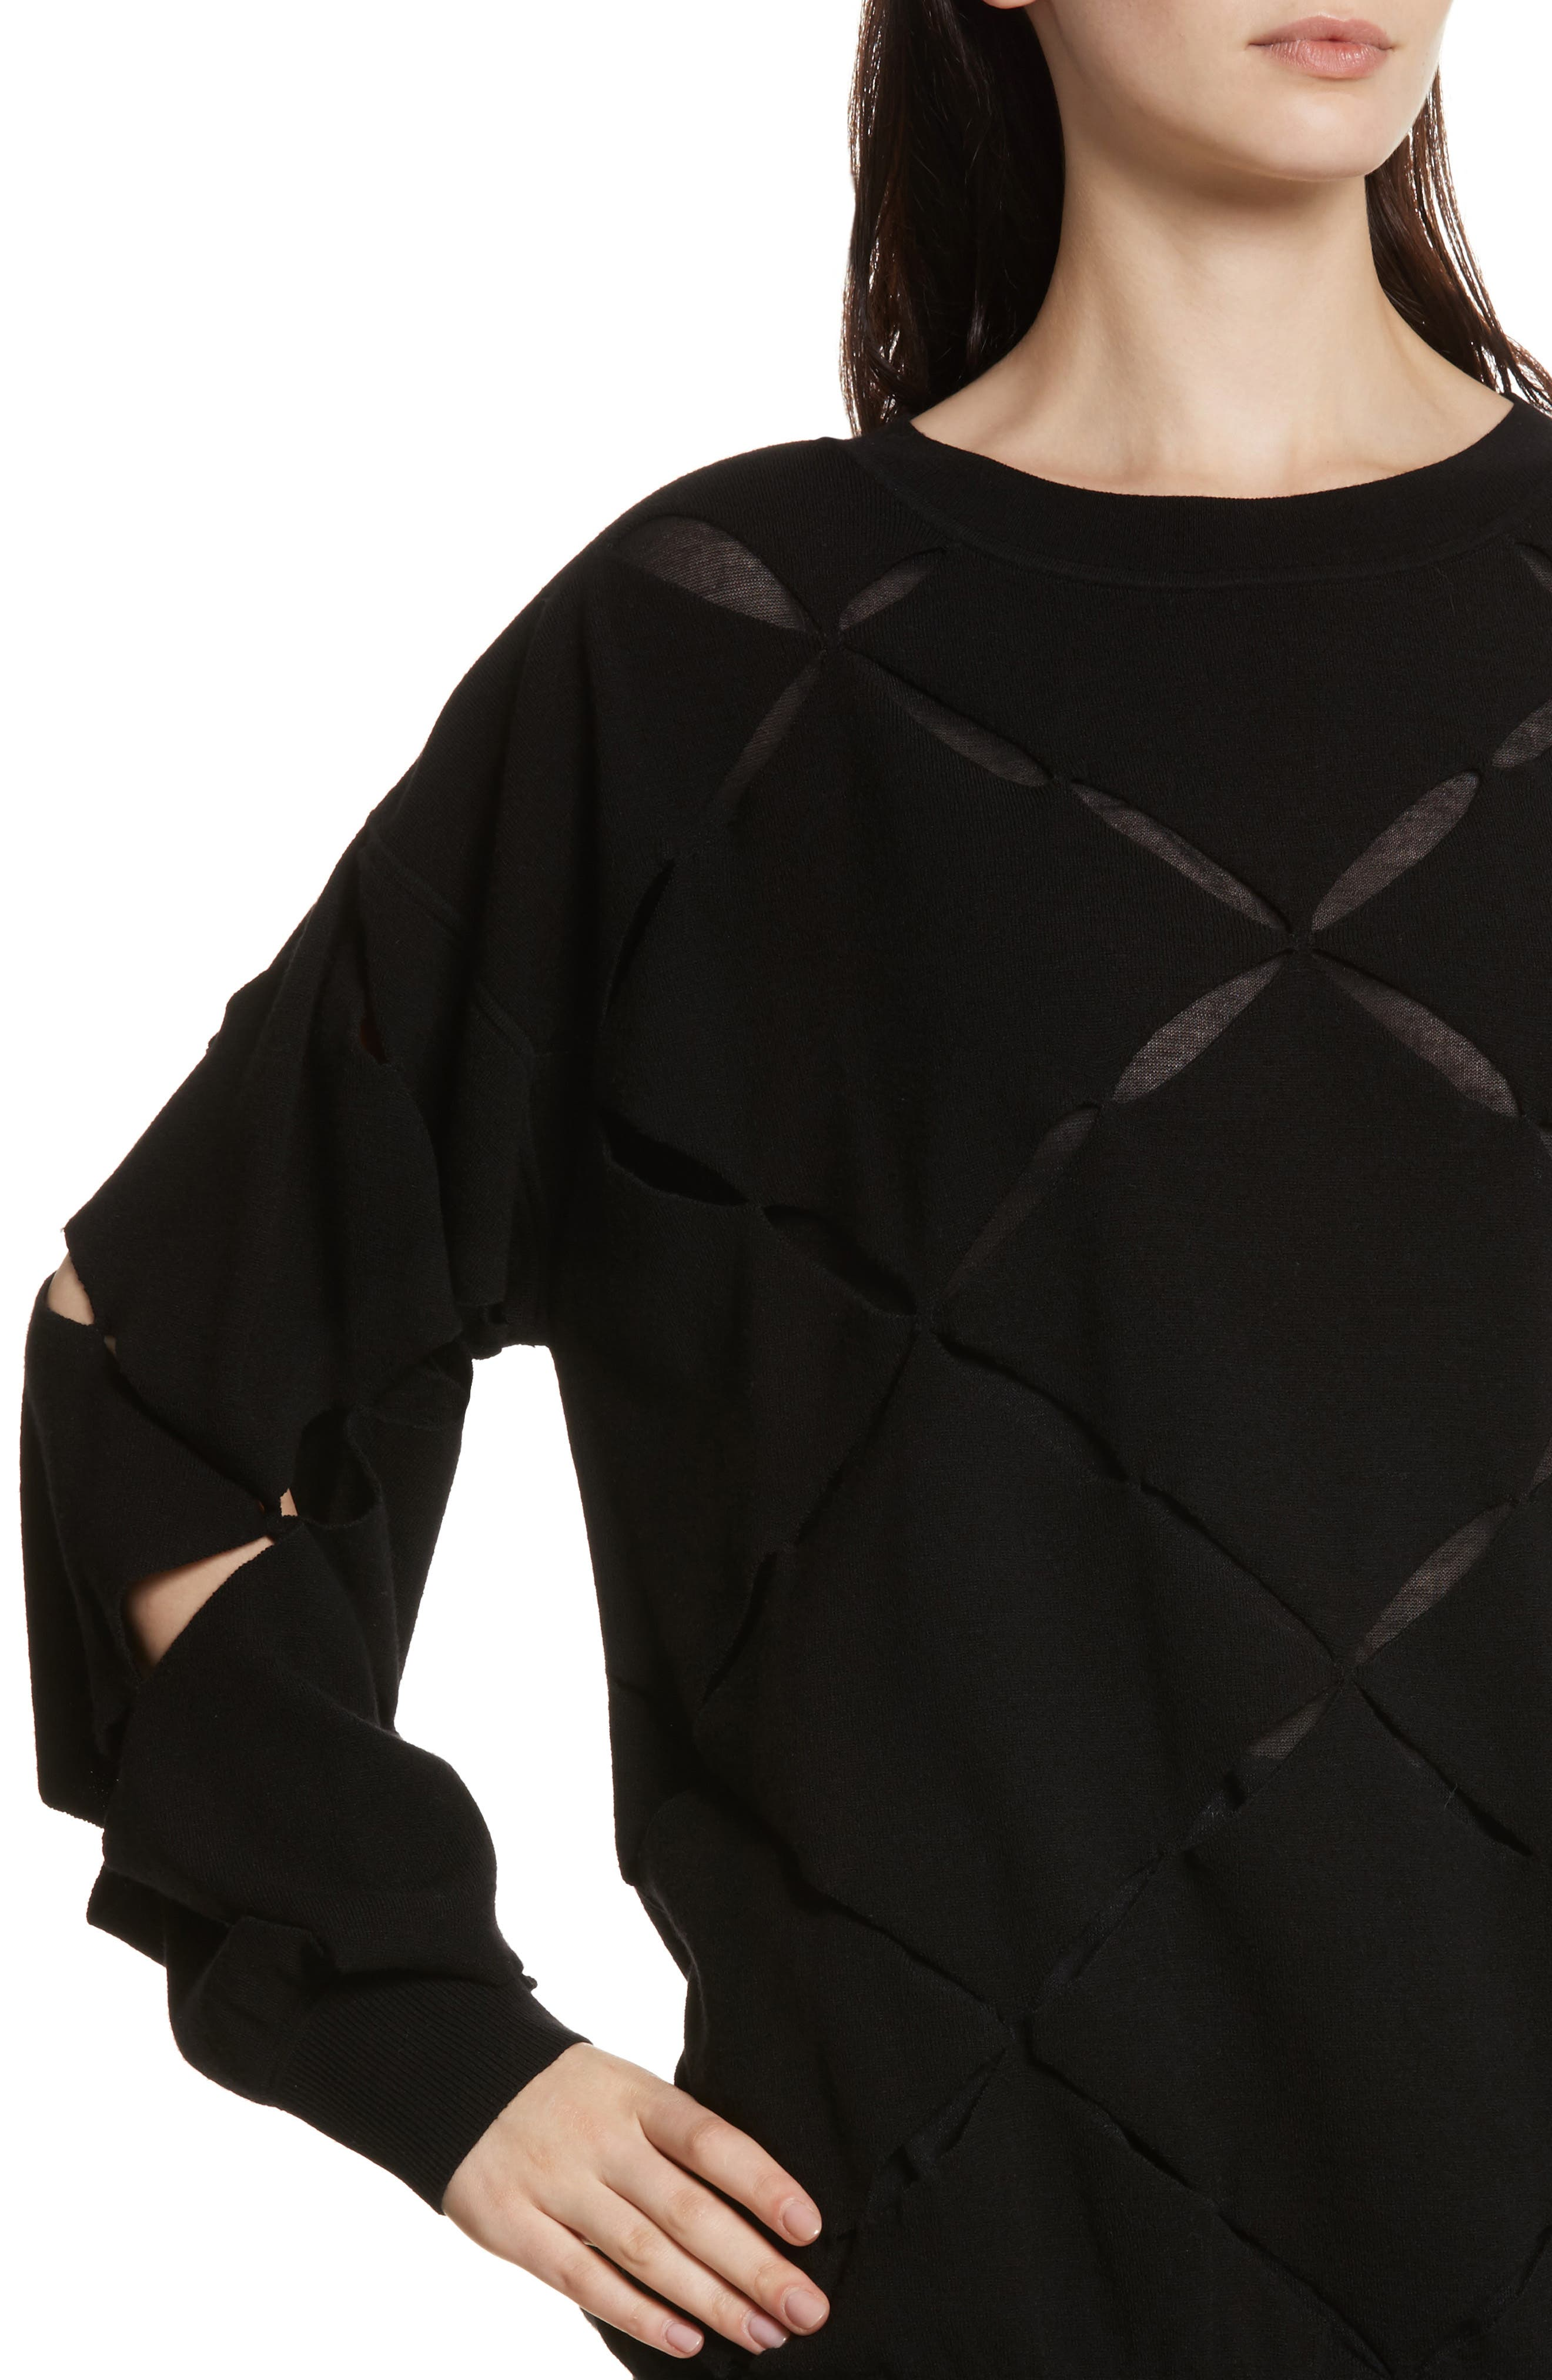 Roz Cutout Sweater,                             Alternate thumbnail 4, color,                             Black